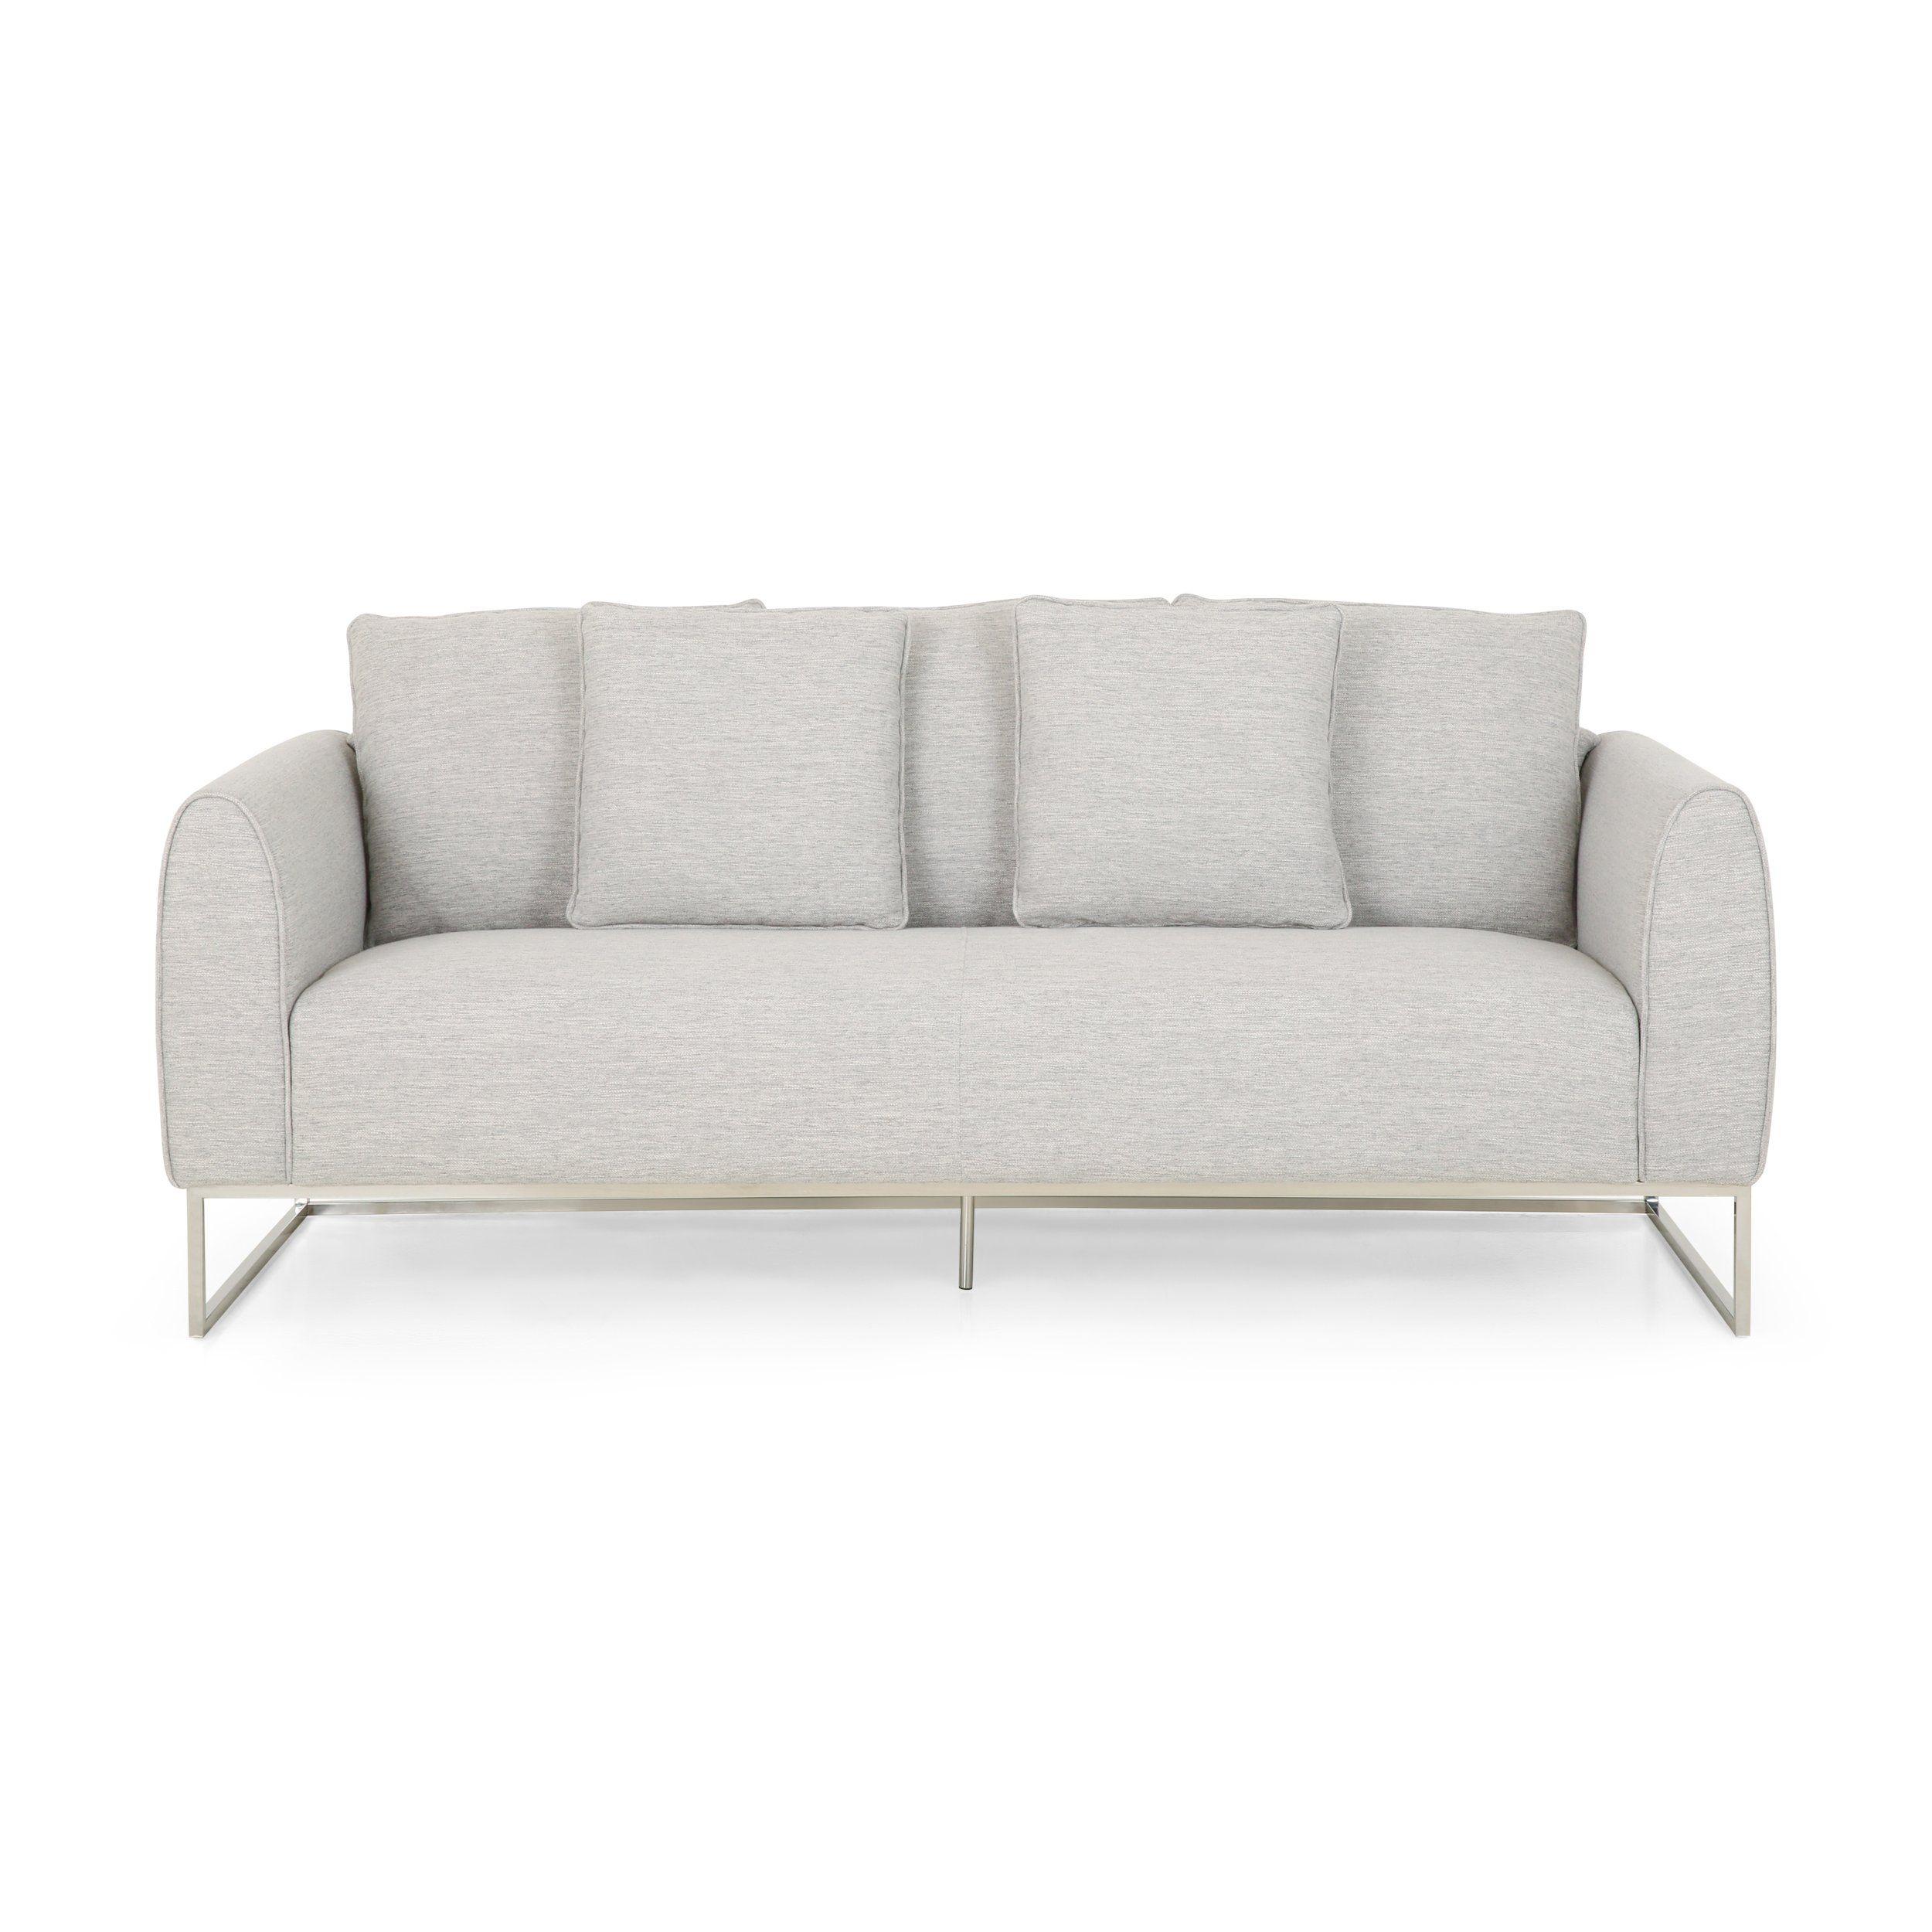 Kastle Modern Fabric 3 Seater Sofa - Light Blush